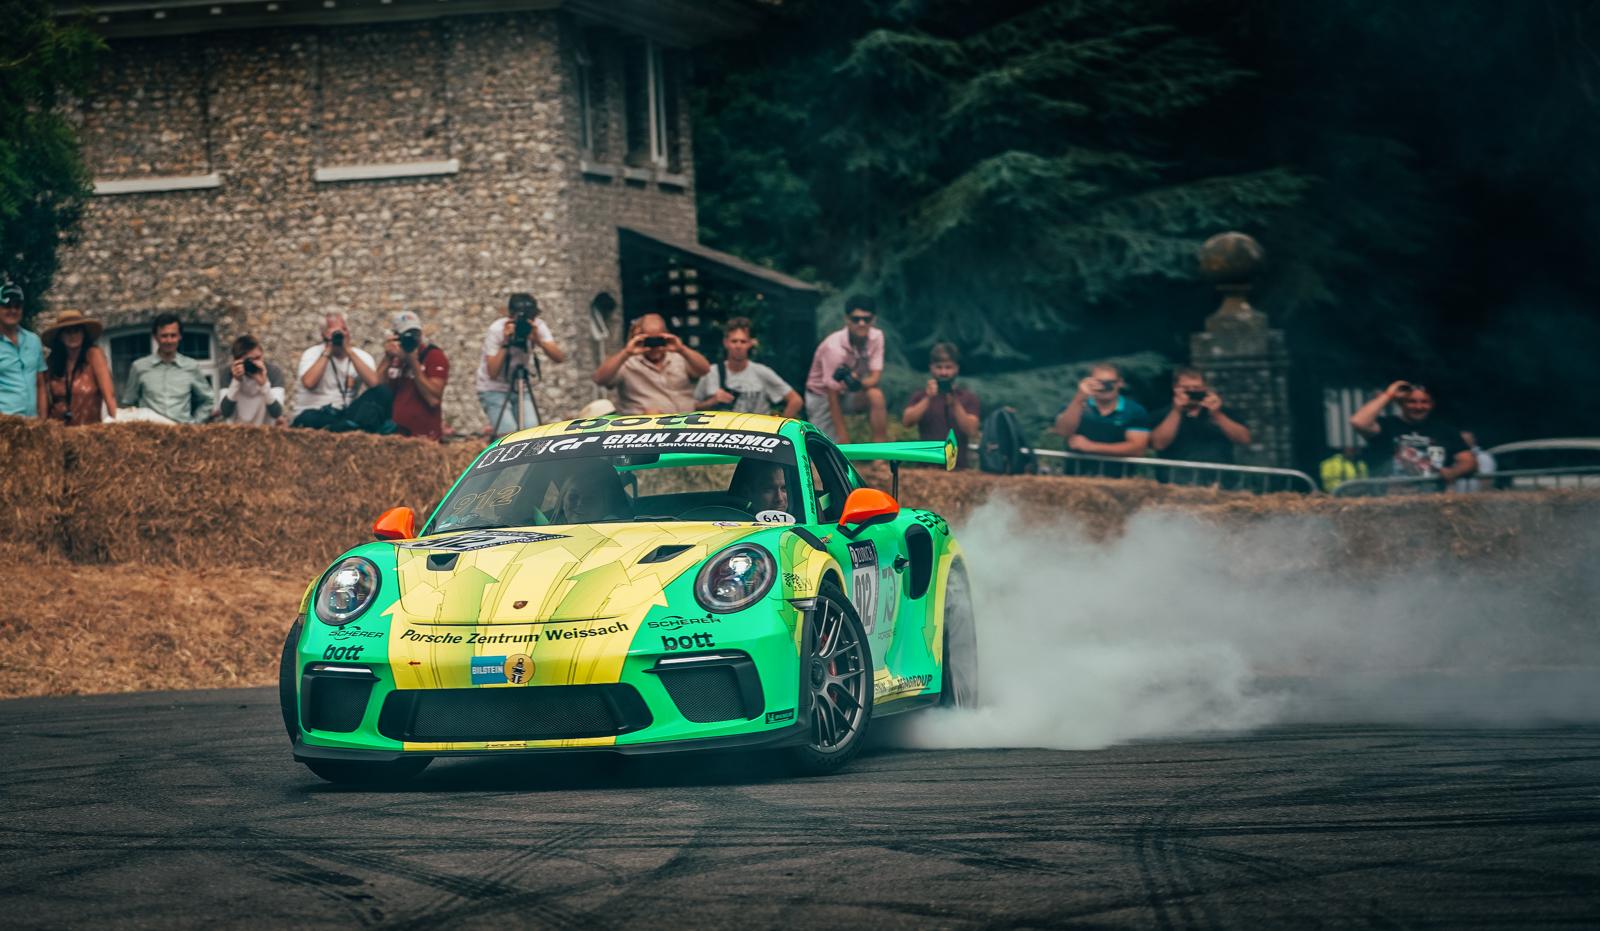 RP - Porsche Goodwood Fesitval of Speed 70 Years 2018-40.jpg